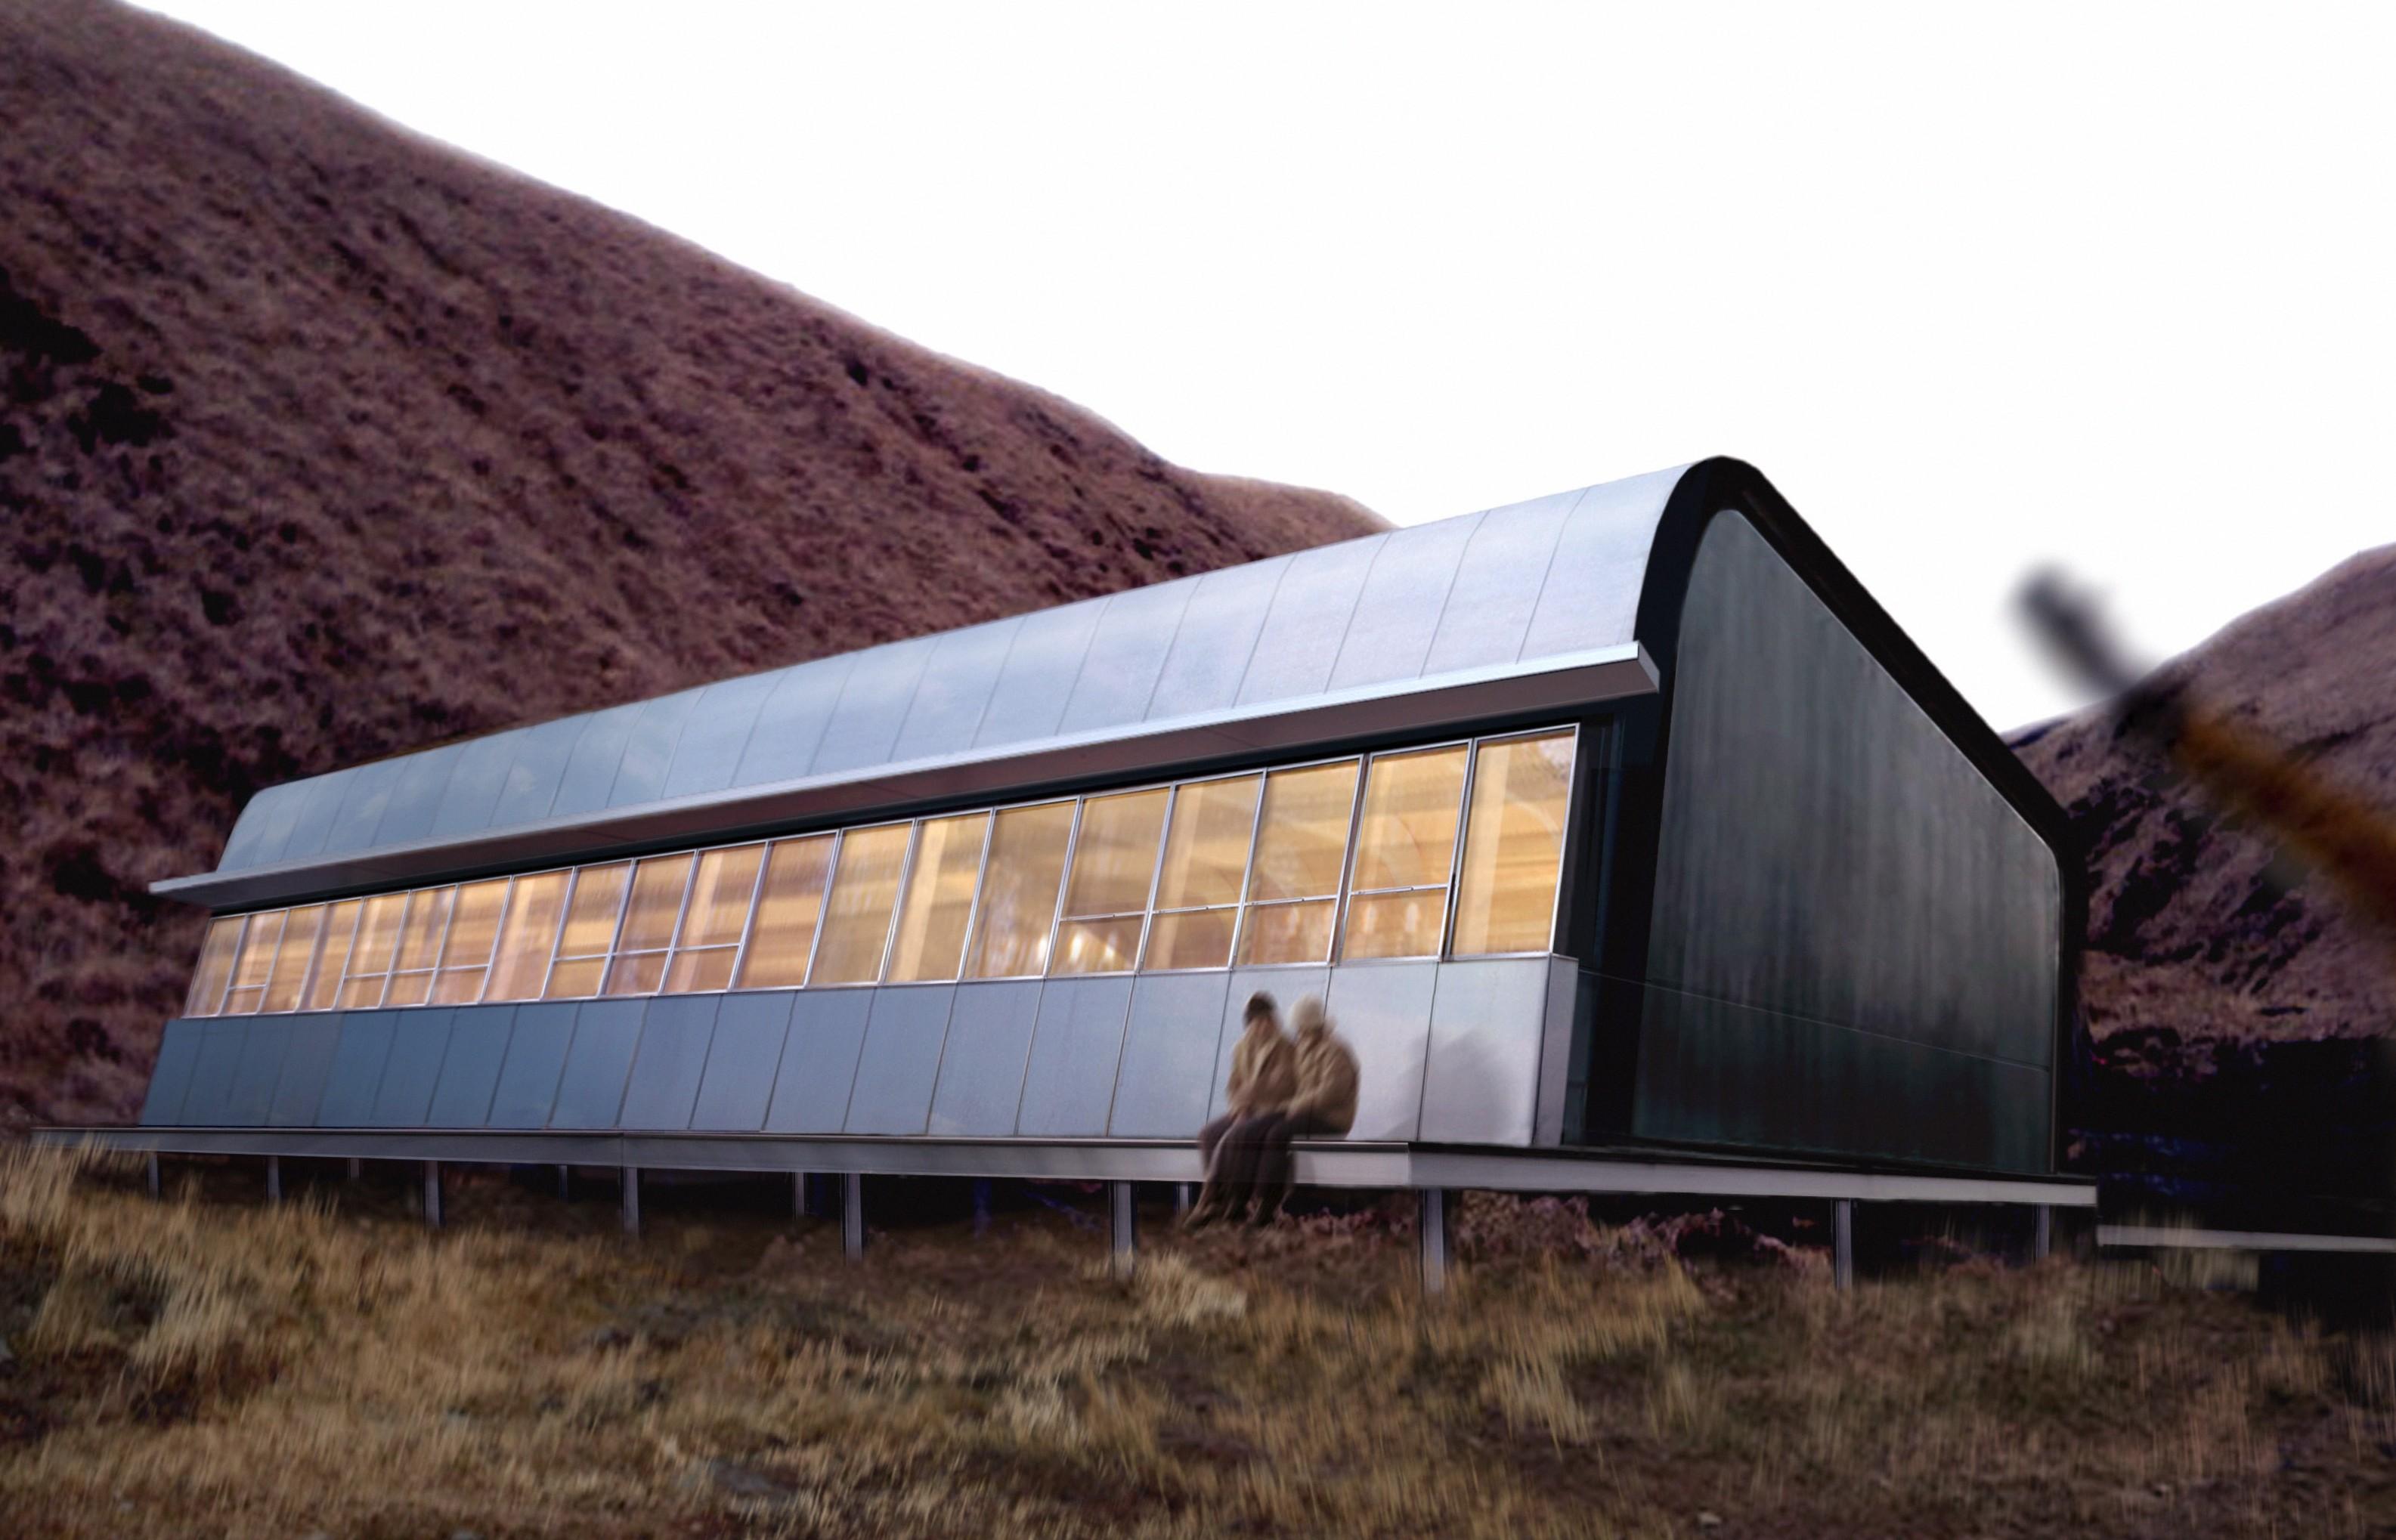 Habitação Experimental na Ilha de Atka / Taller Abierto, Cortesia Taller Abierto